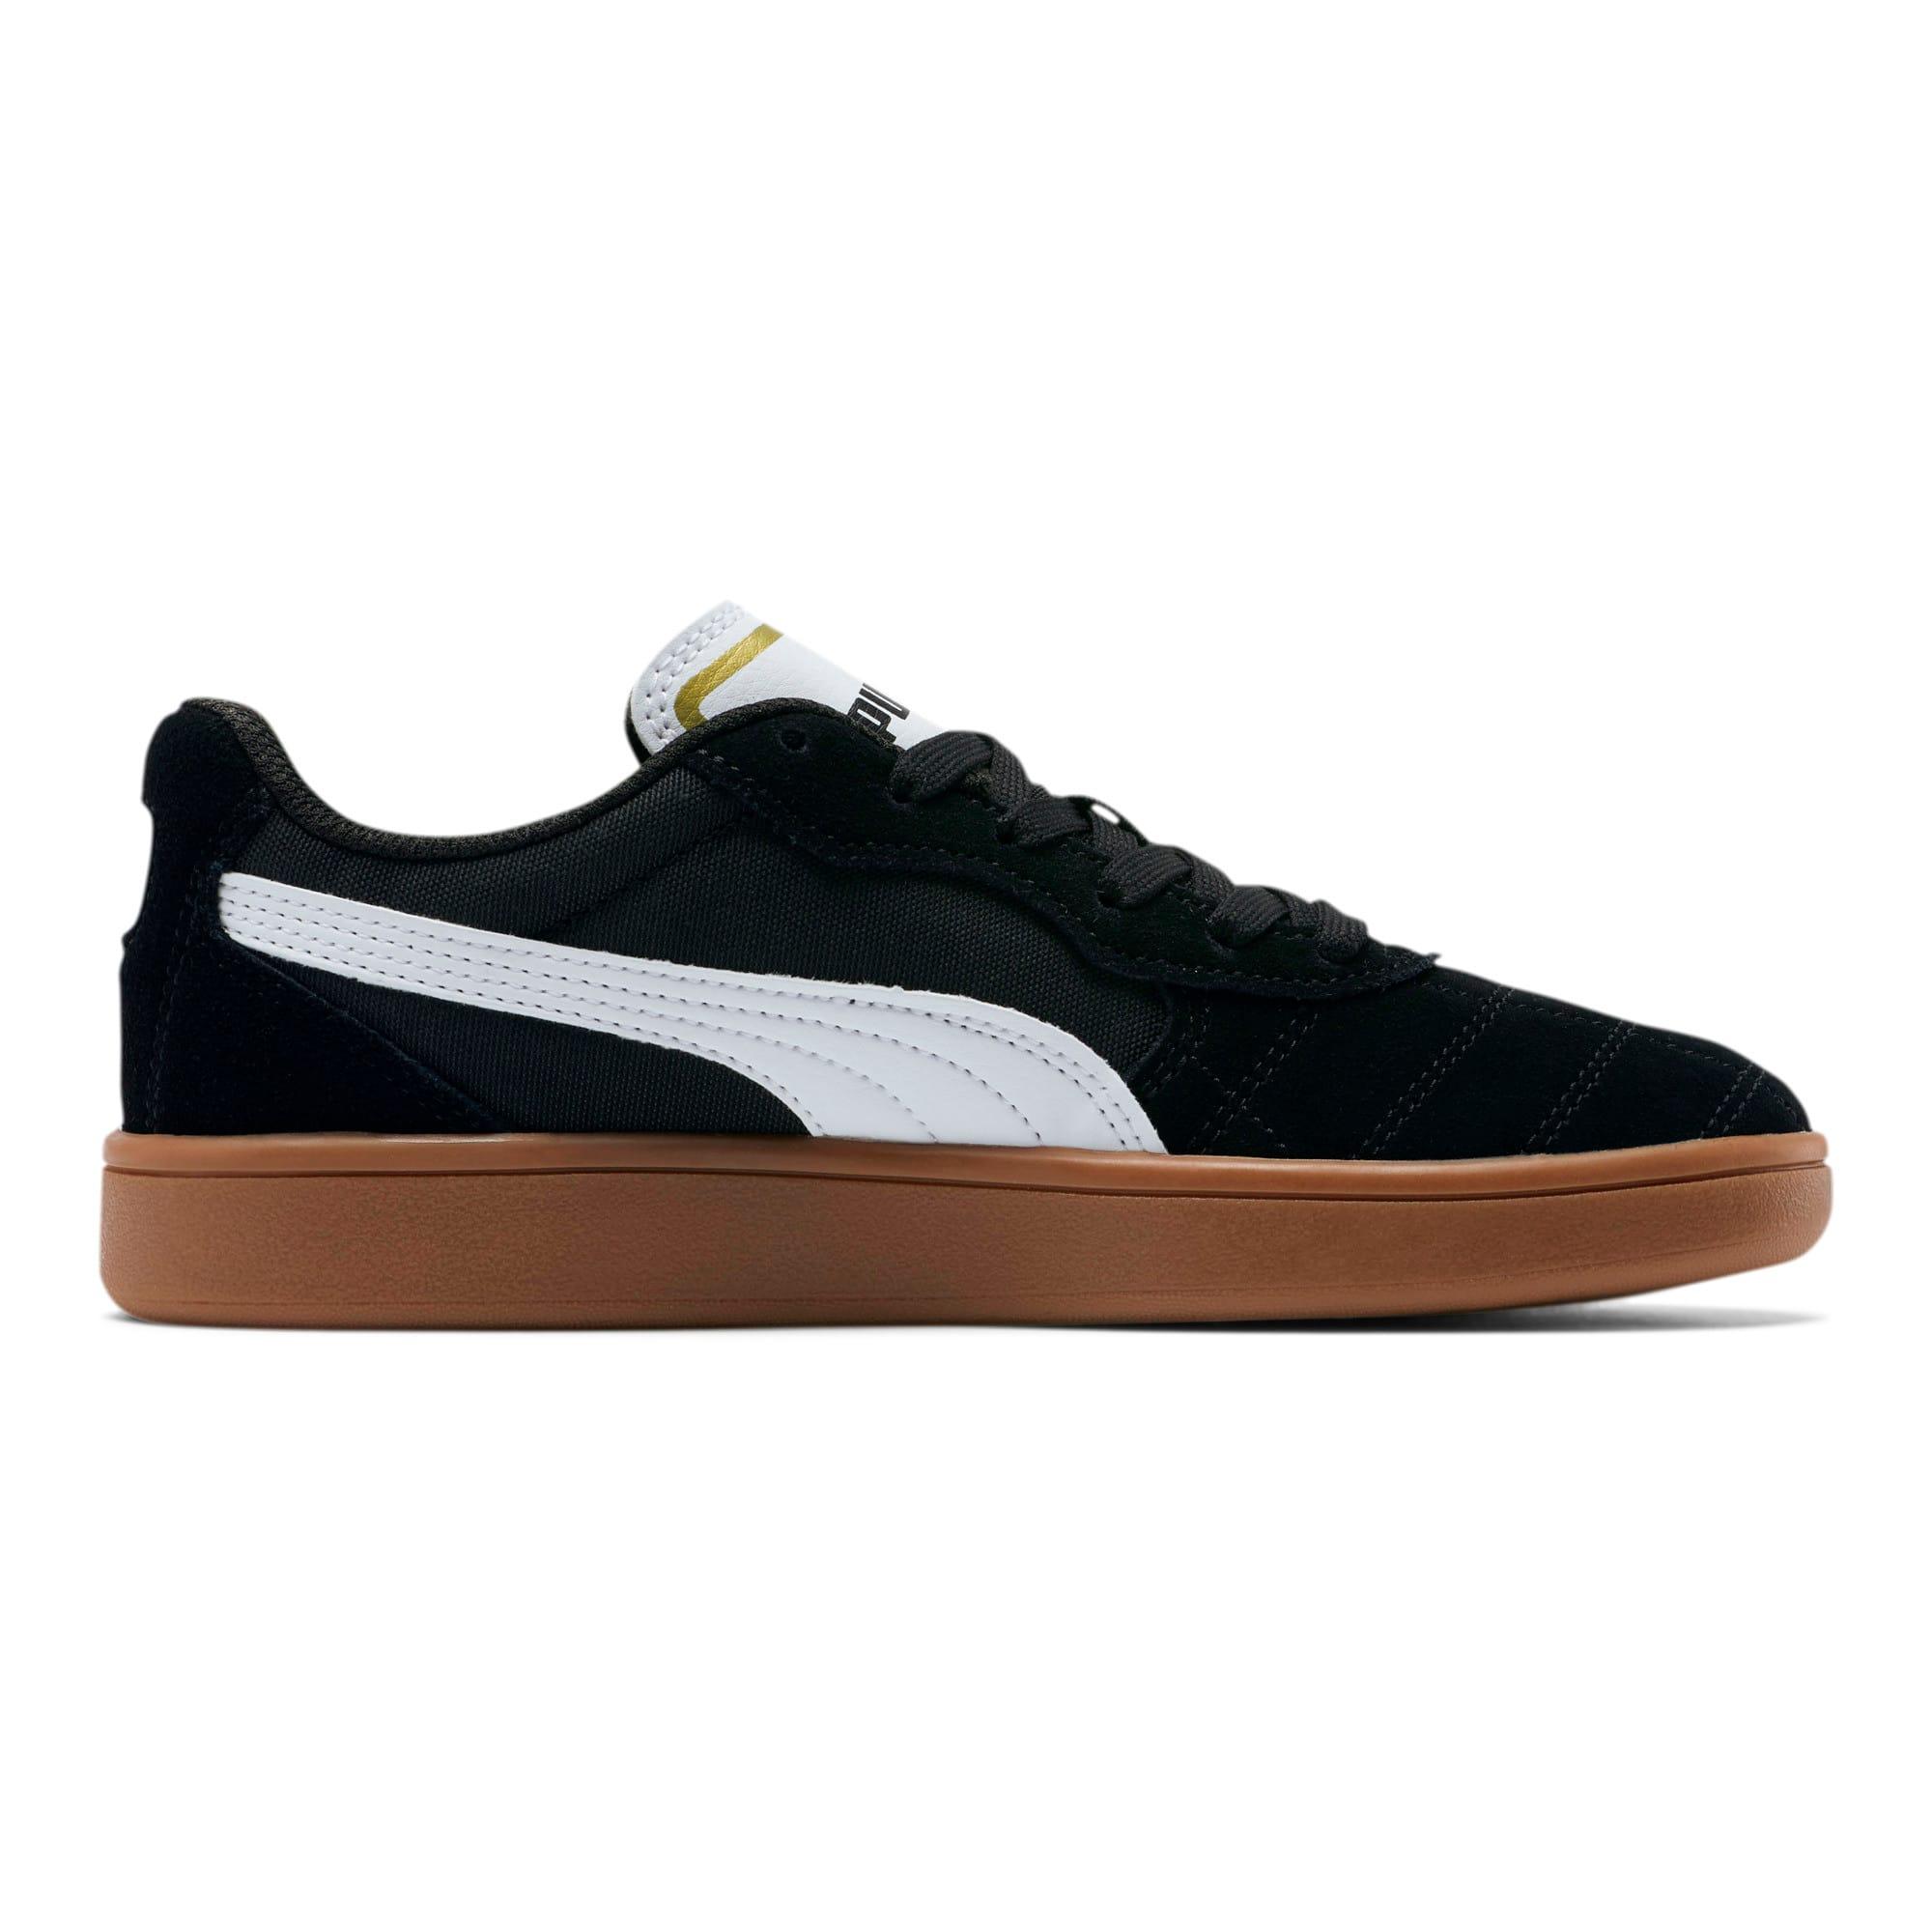 Thumbnail 5 of Astro Kick Sneakers JR, Puma Black-Puma White-Gold, medium